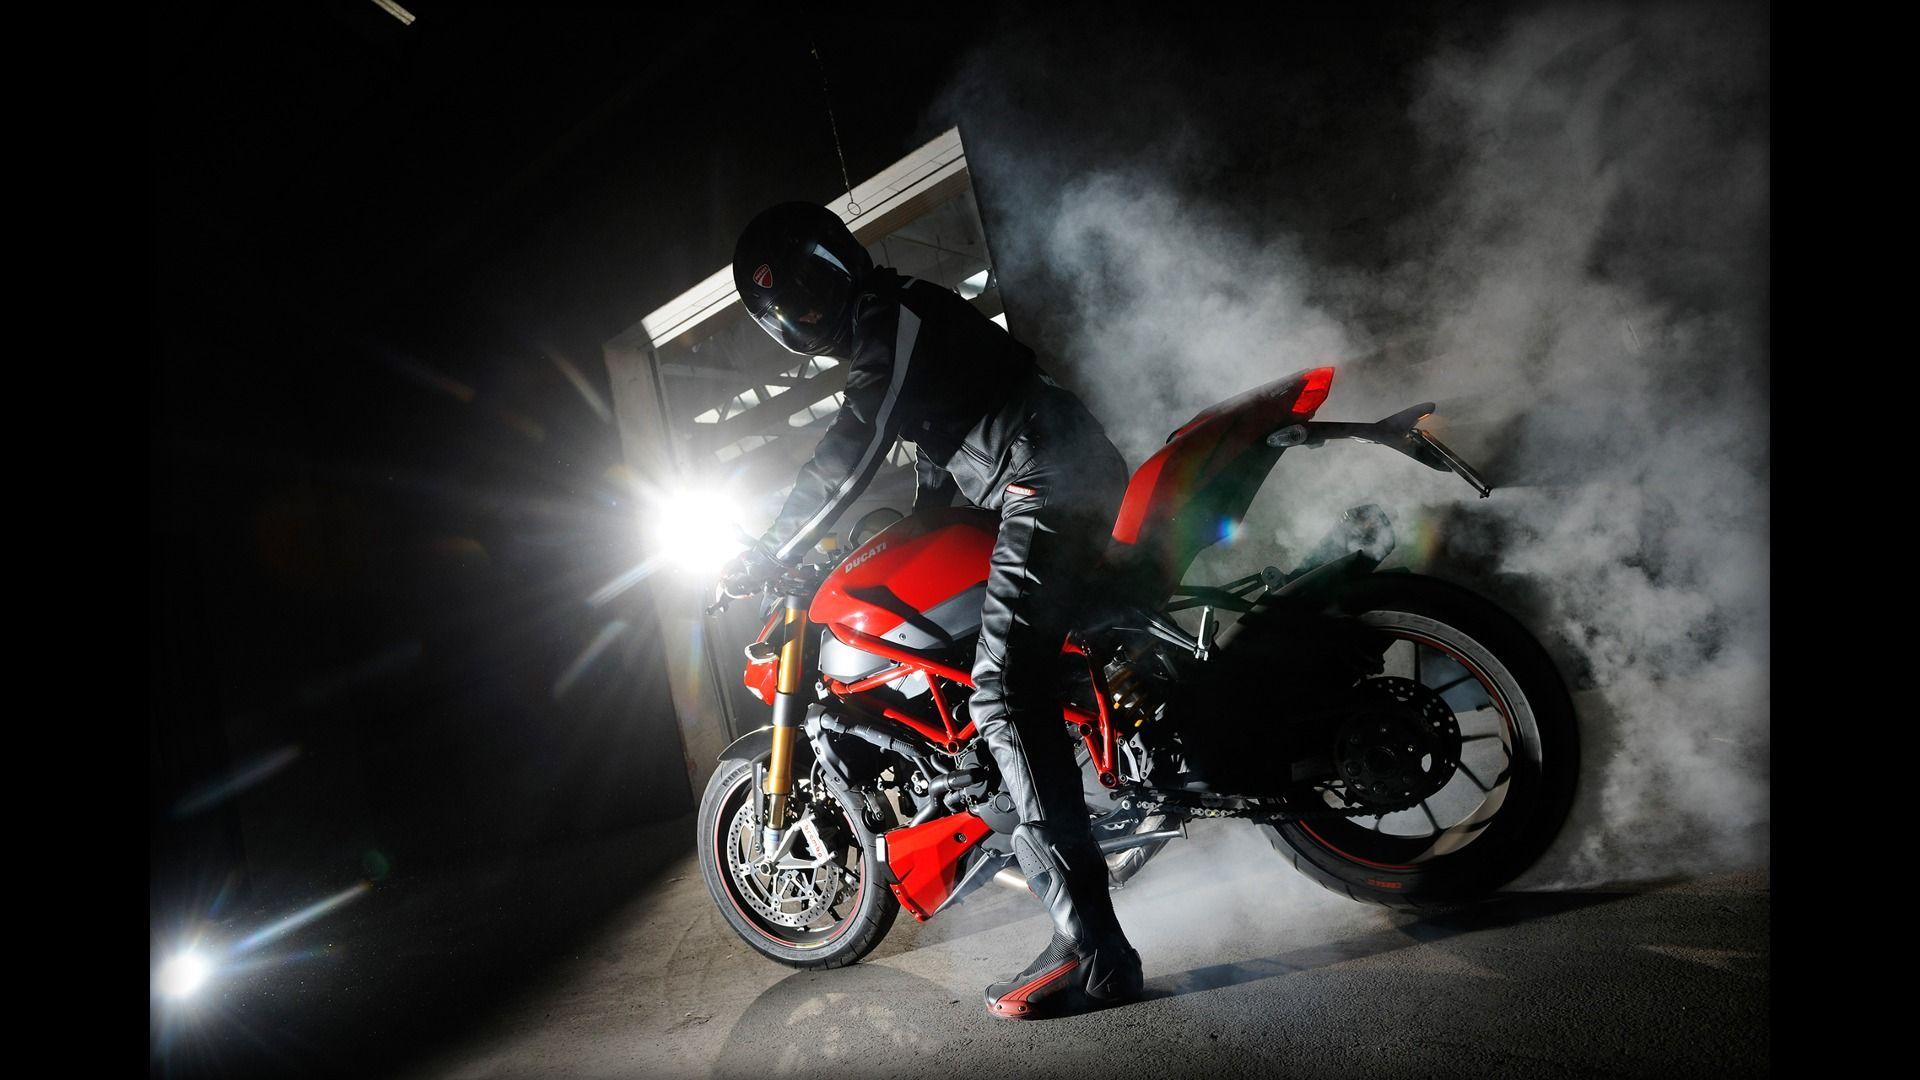 Permalink to Motorcycle Wallpaper Tumblr